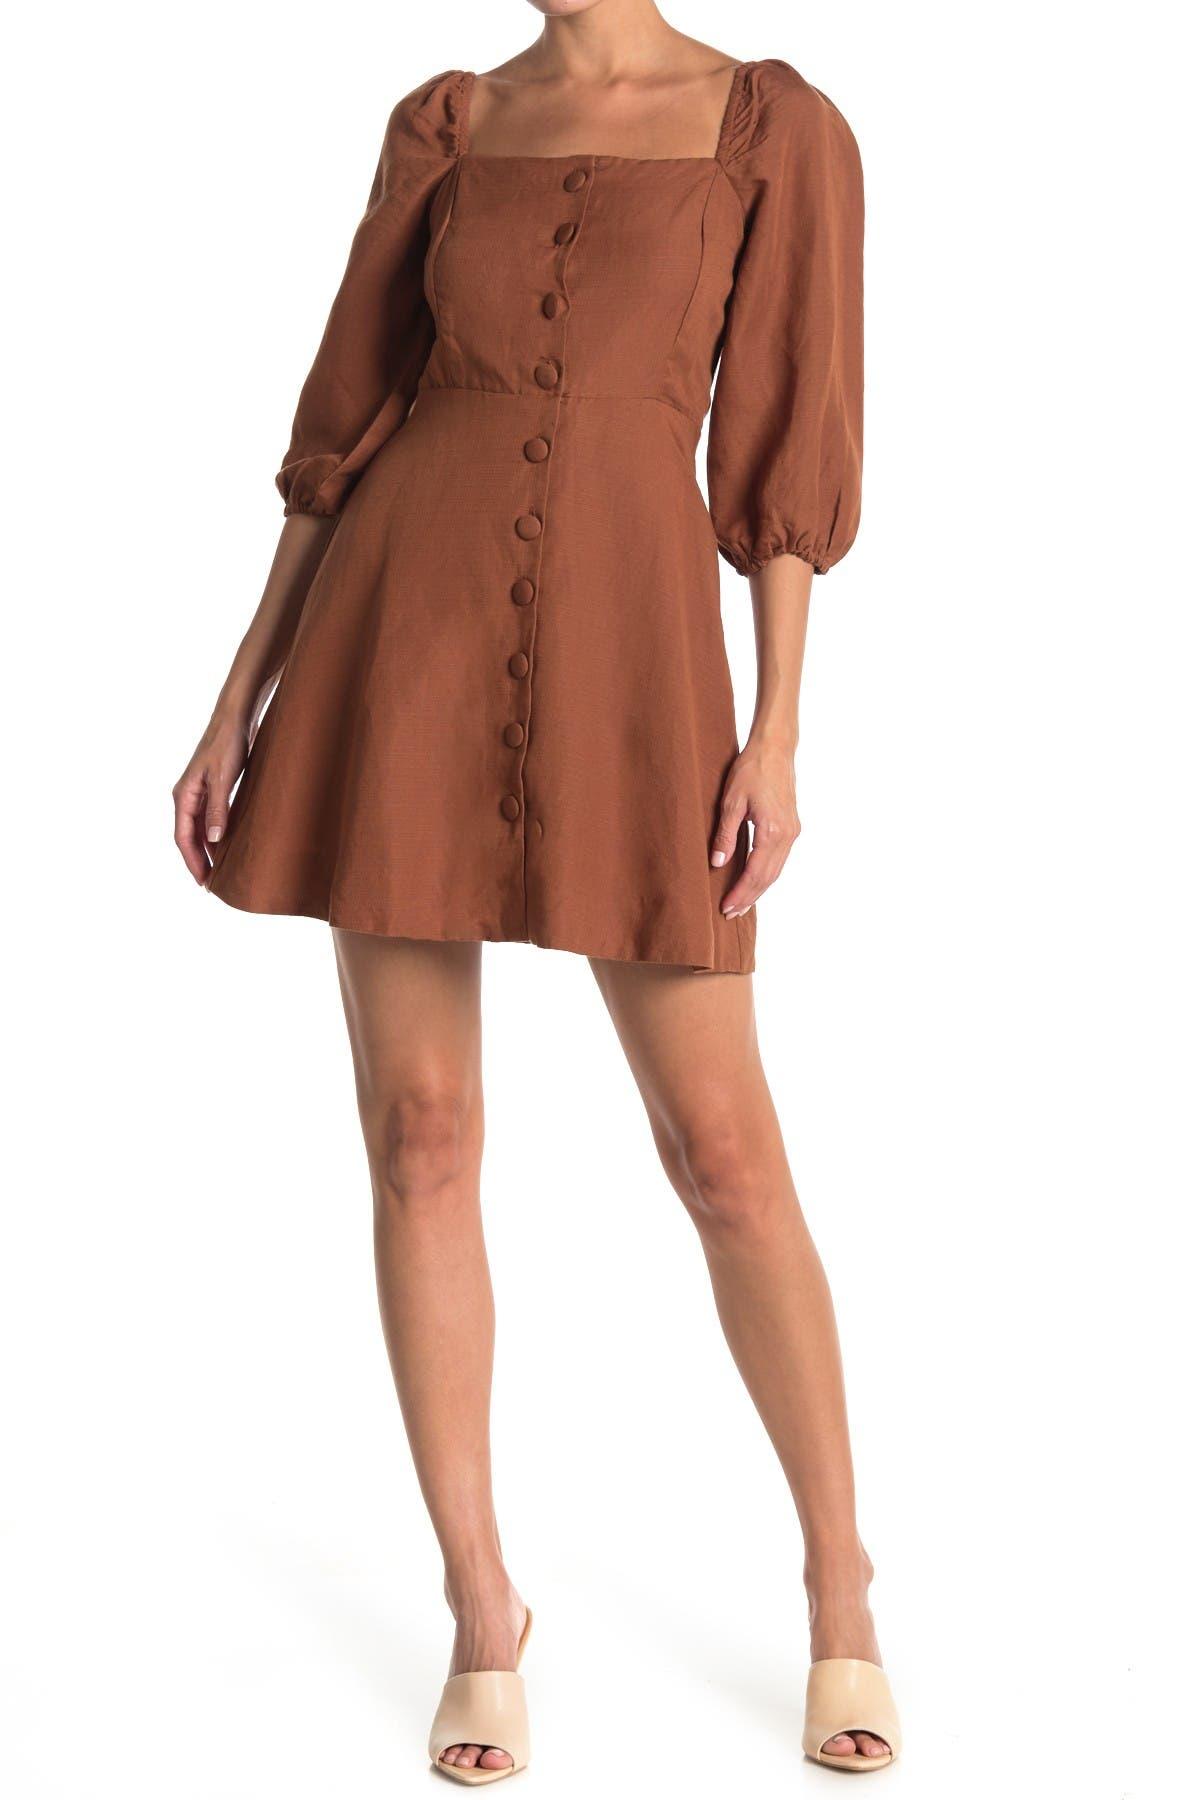 Image of Amuse Society Raya Short Sleeve Woven Dress